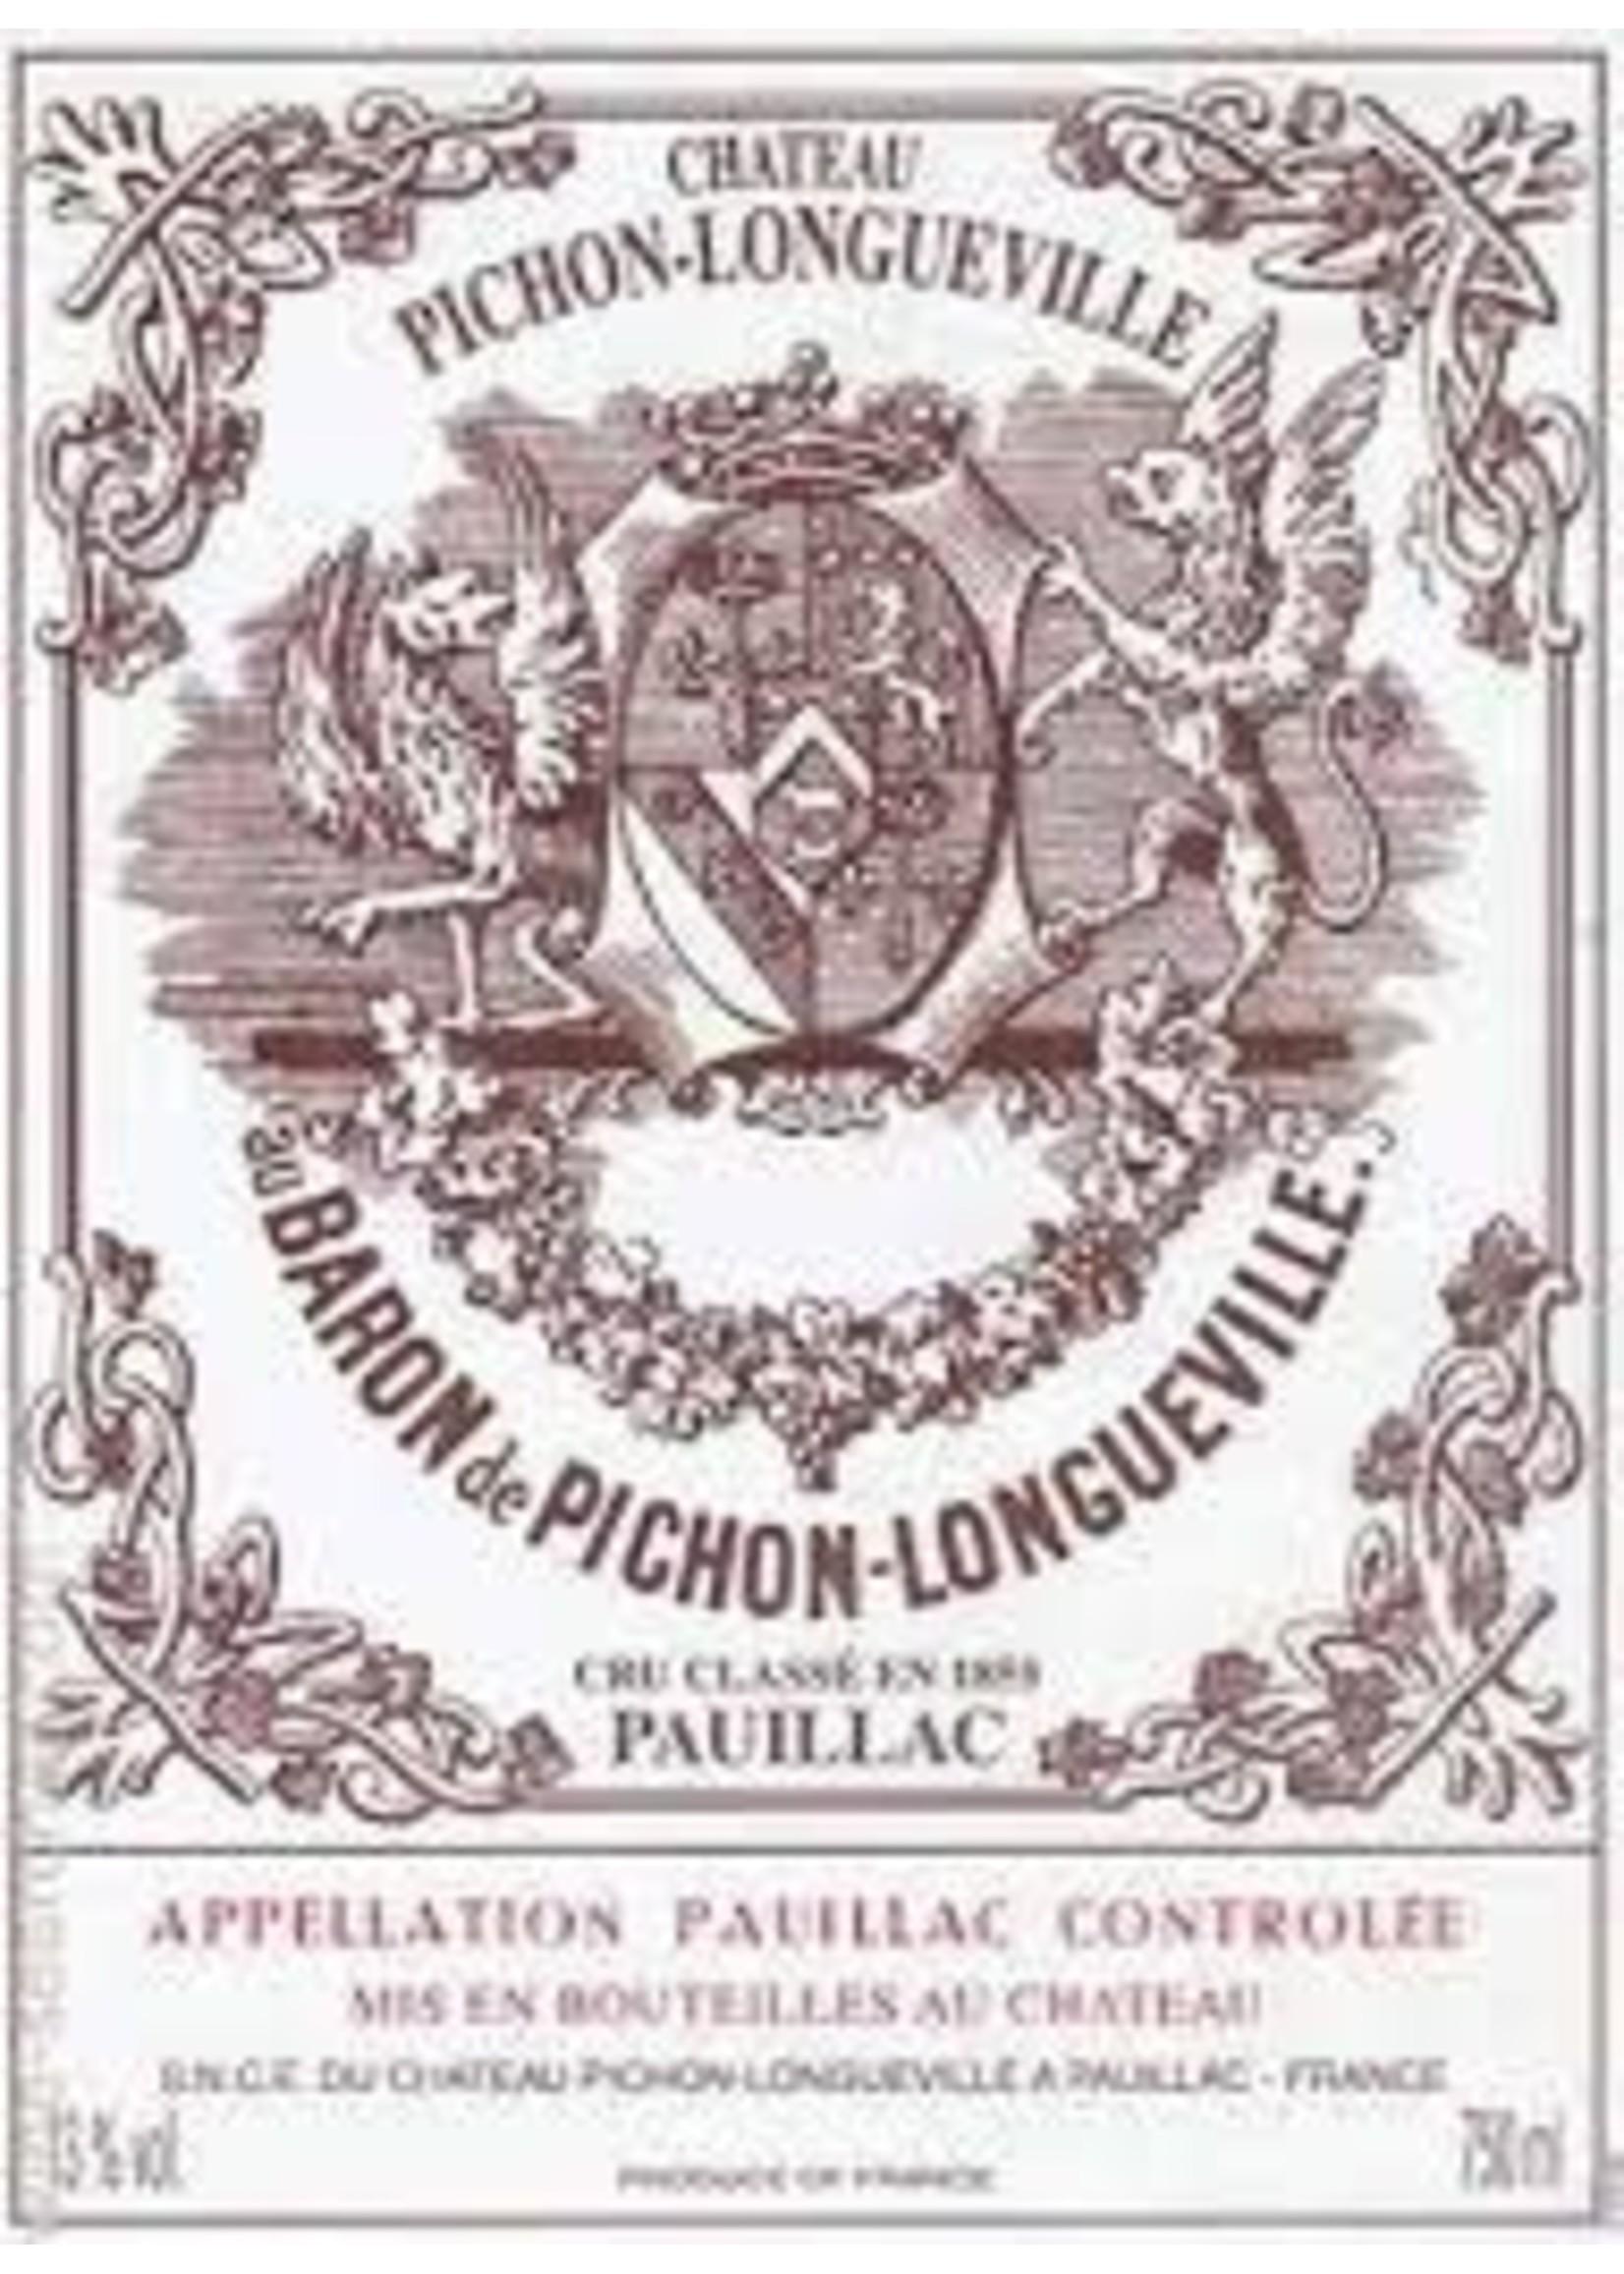 Chateau Pichon-Longueville Baron 2000 Pauillac 750ml [PRE-ARRIVAL]